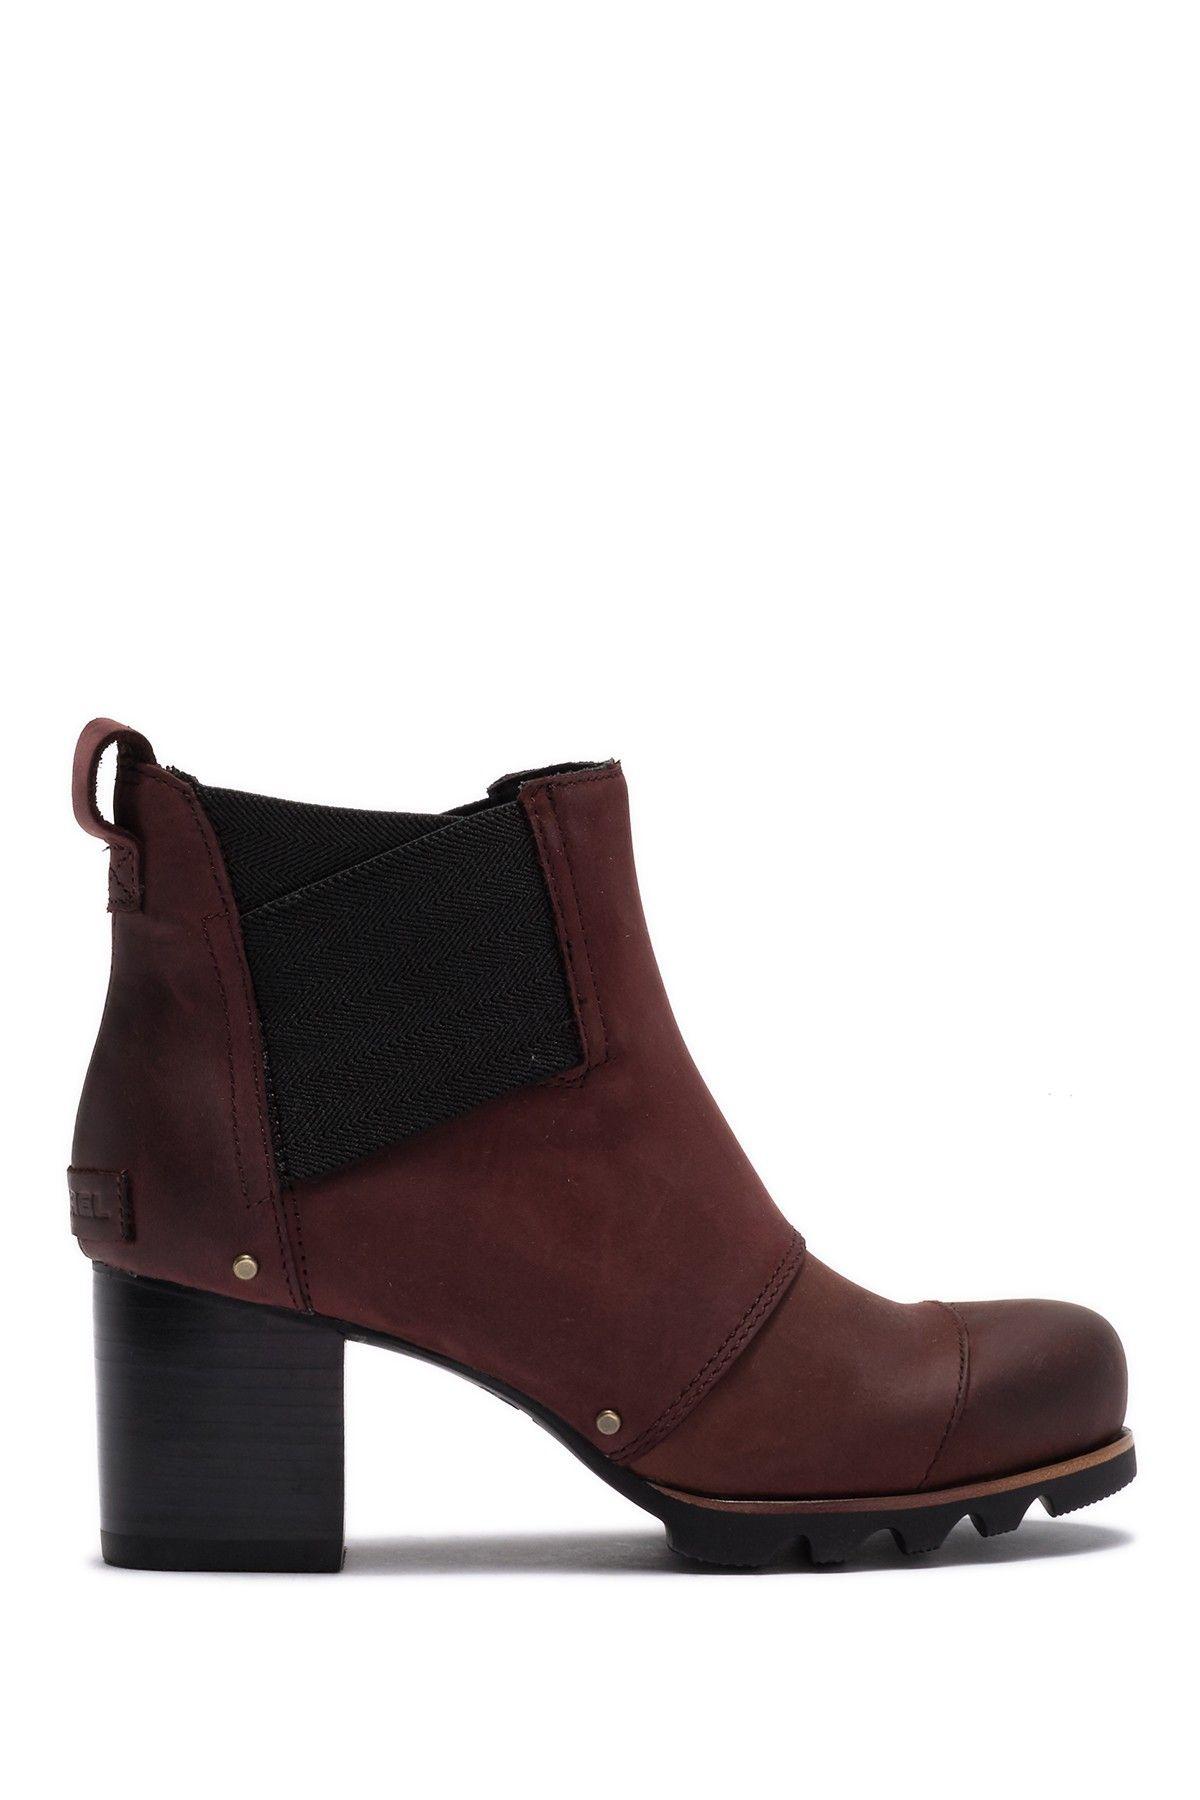 e2fa5f755d0 Addington Waterproof Leather Chelsea Bootie by Sorel on  nordstrom rack